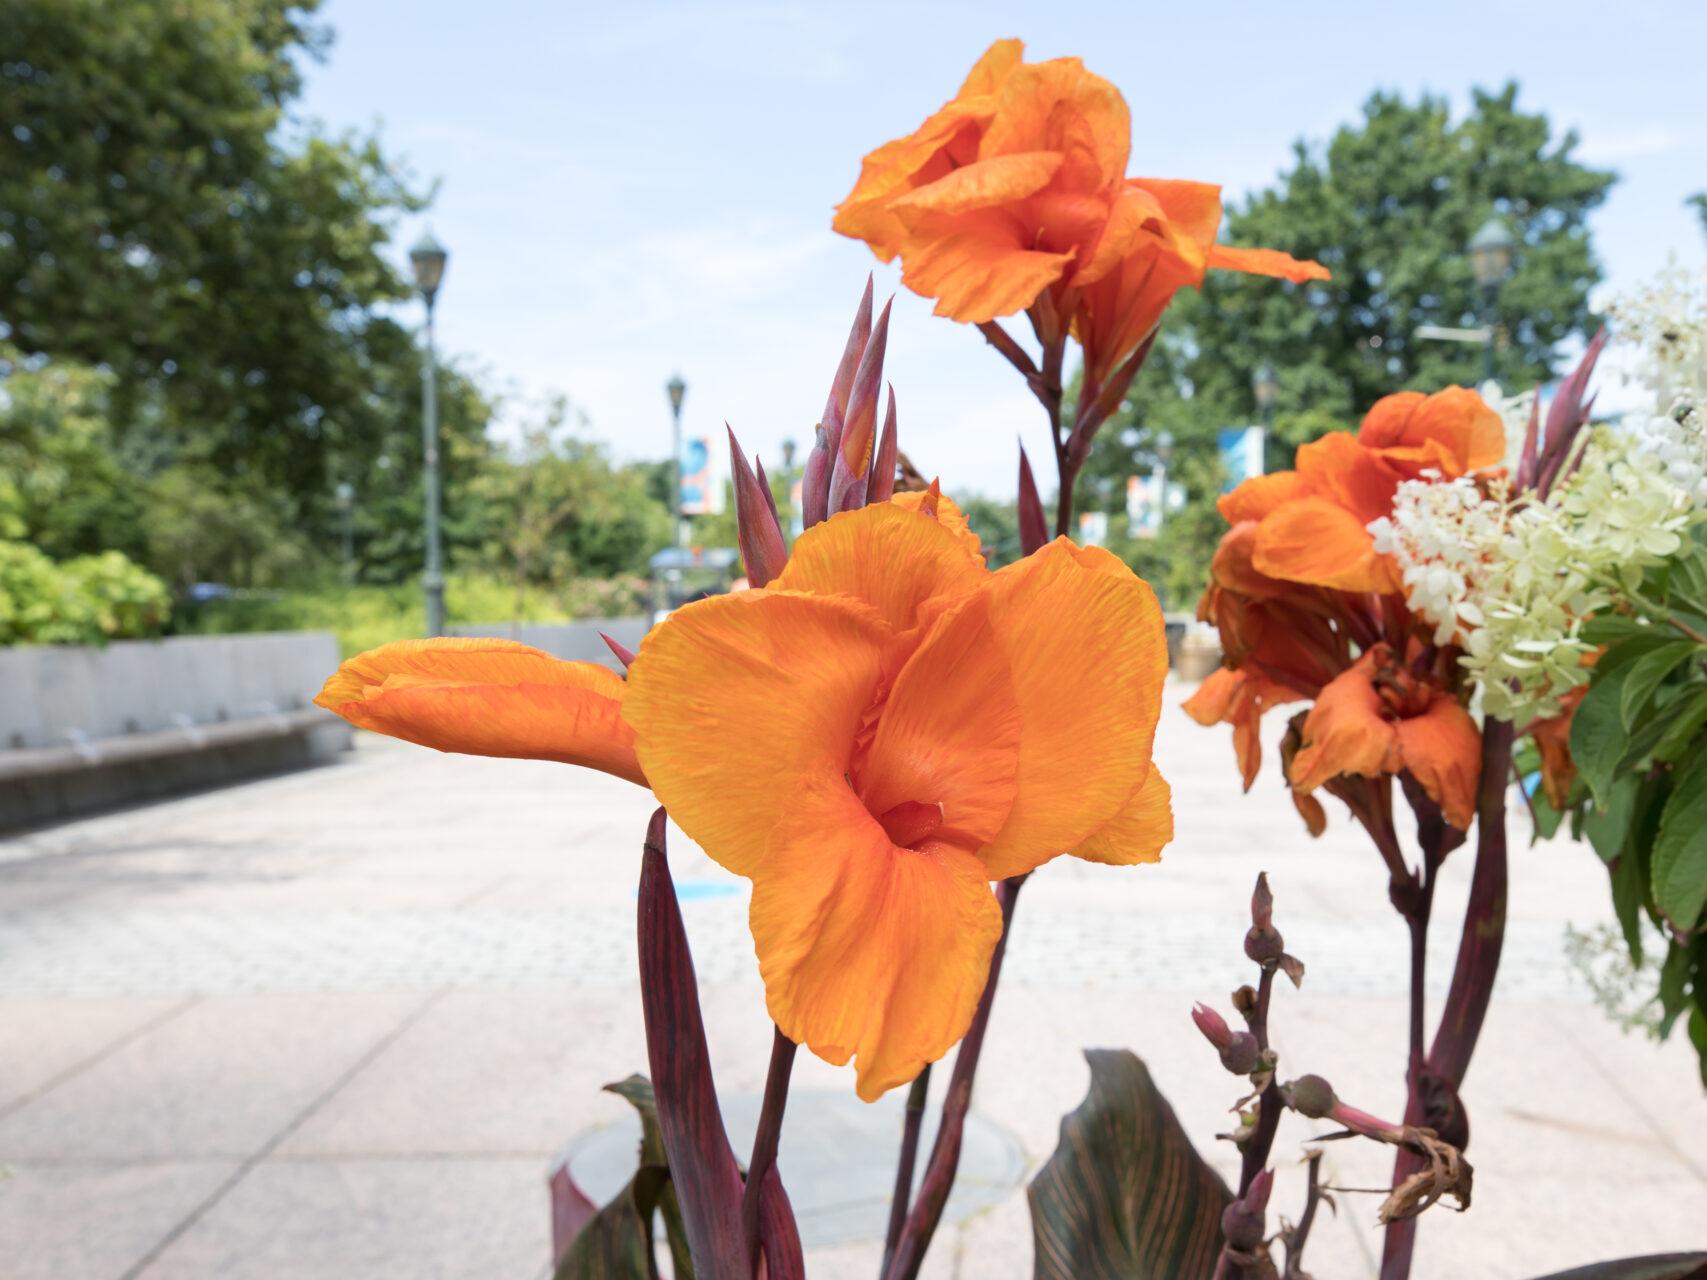 Orange Canna Lilies